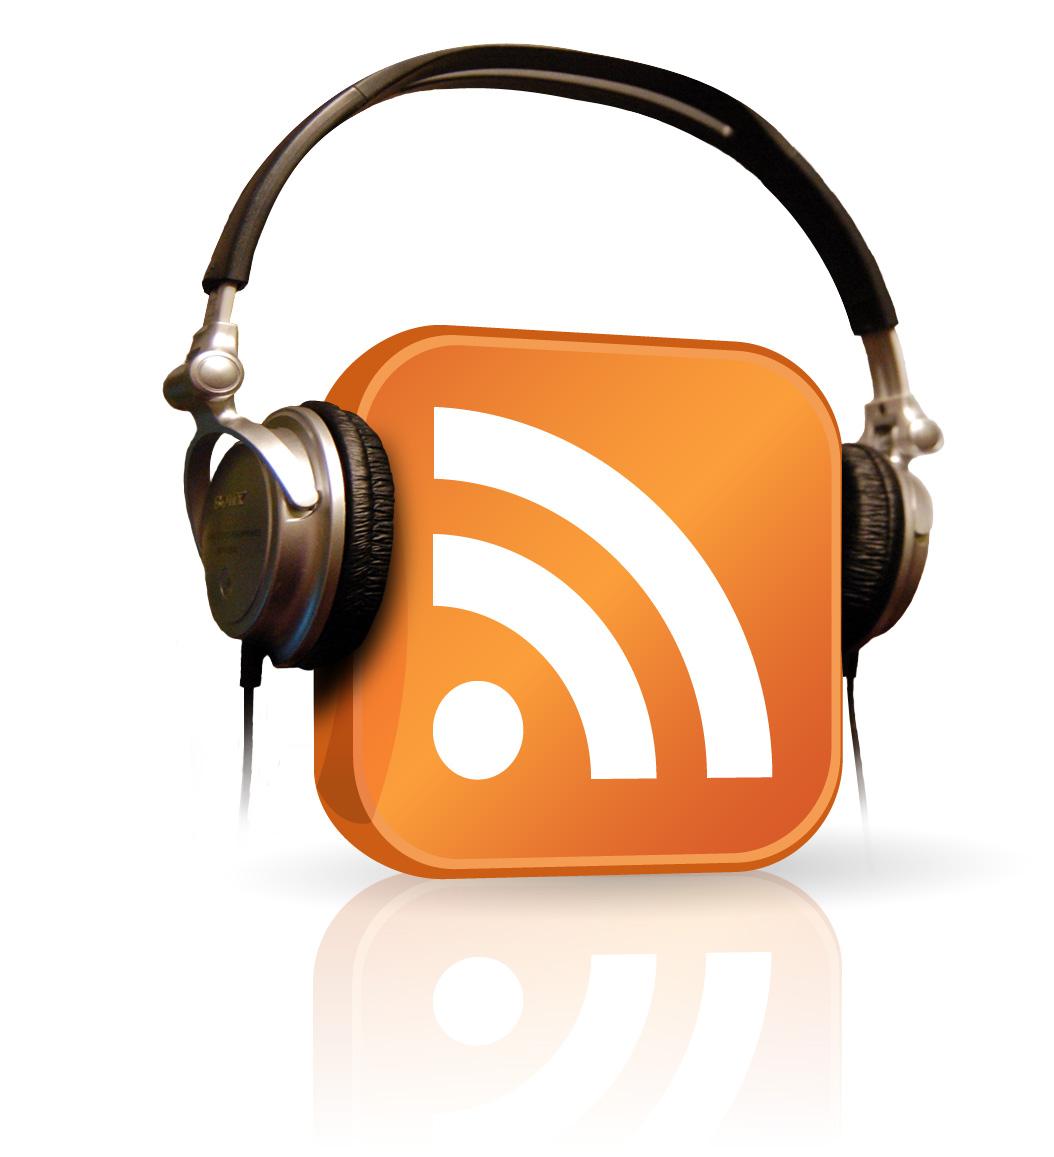 Podcastlogo Free: Modified Podcast Logo With My Headphones Photoshopped On